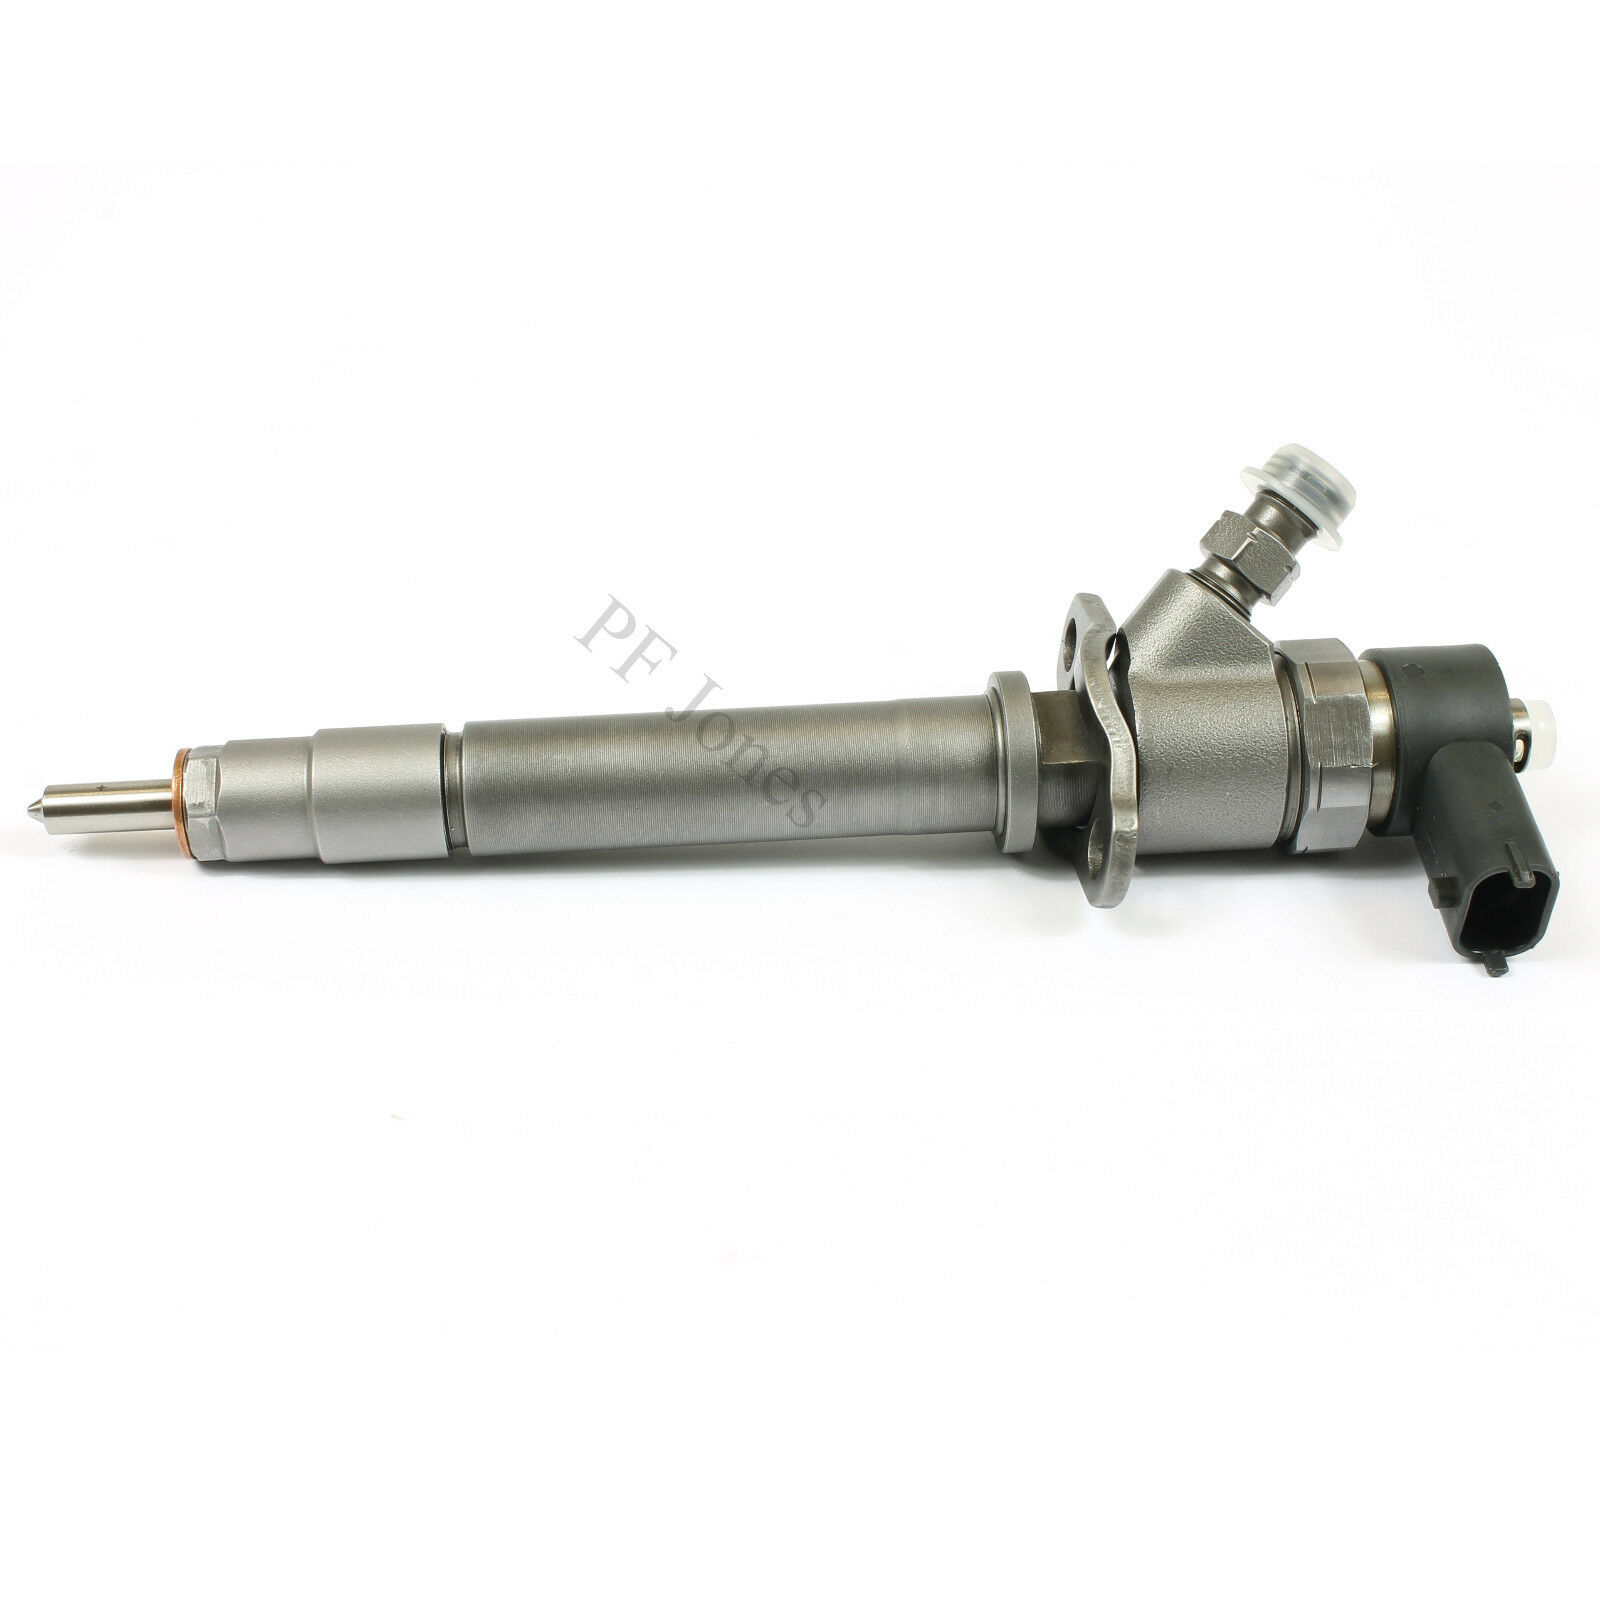 HELLA AC evaporador 8FV351330-711 OE 6Q0820103F 6Q0820103 reemplaza a 8FV351211-561